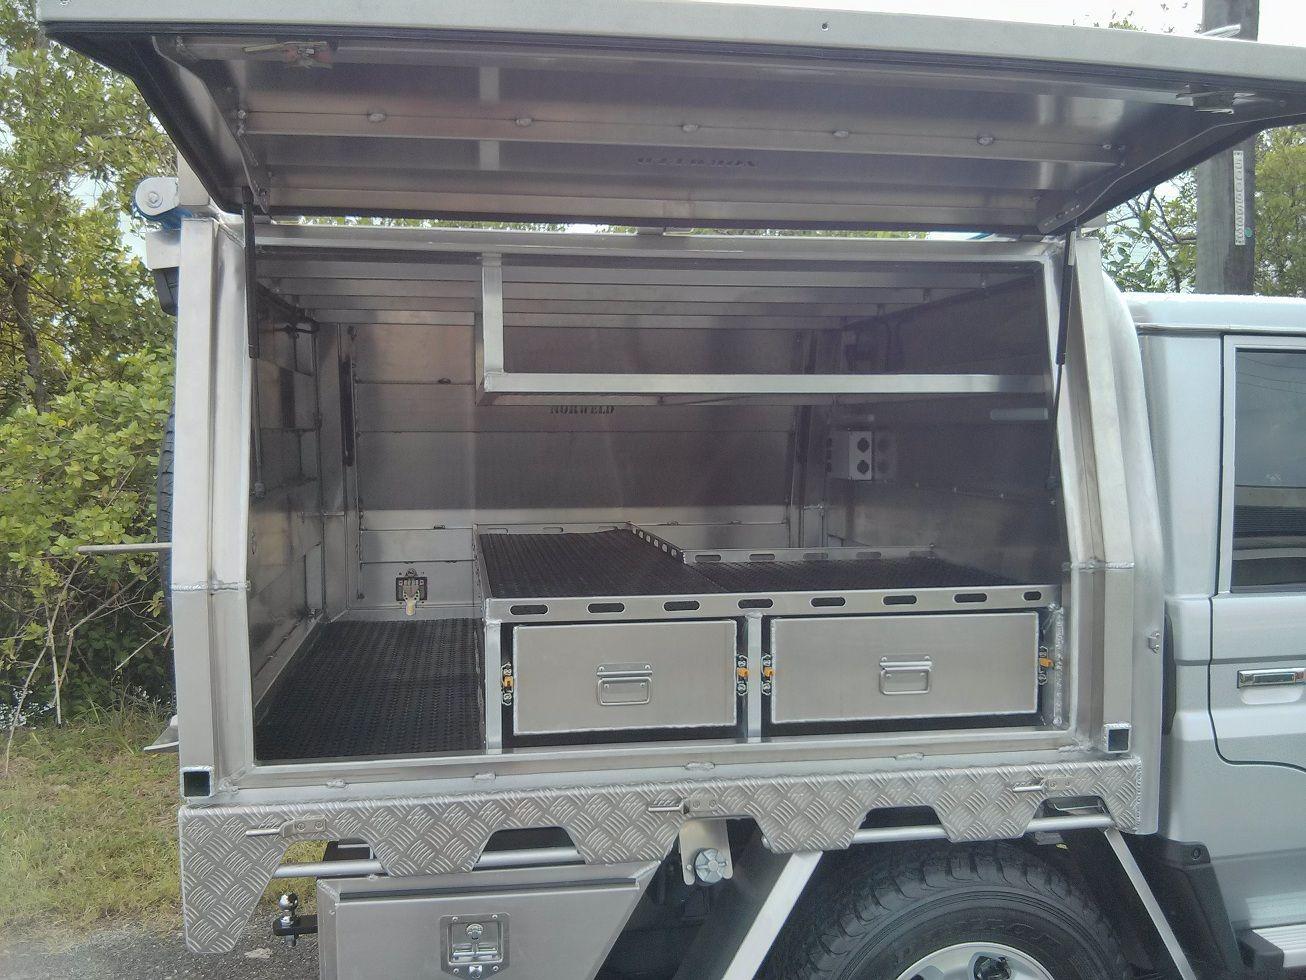 Motor Vehicle Canopies - Norweld Aluminium Fabrication Specialists - Norweldu2026 & Motor Vehicle Canopies - Norweld Aluminium Fabrication Specialists ...